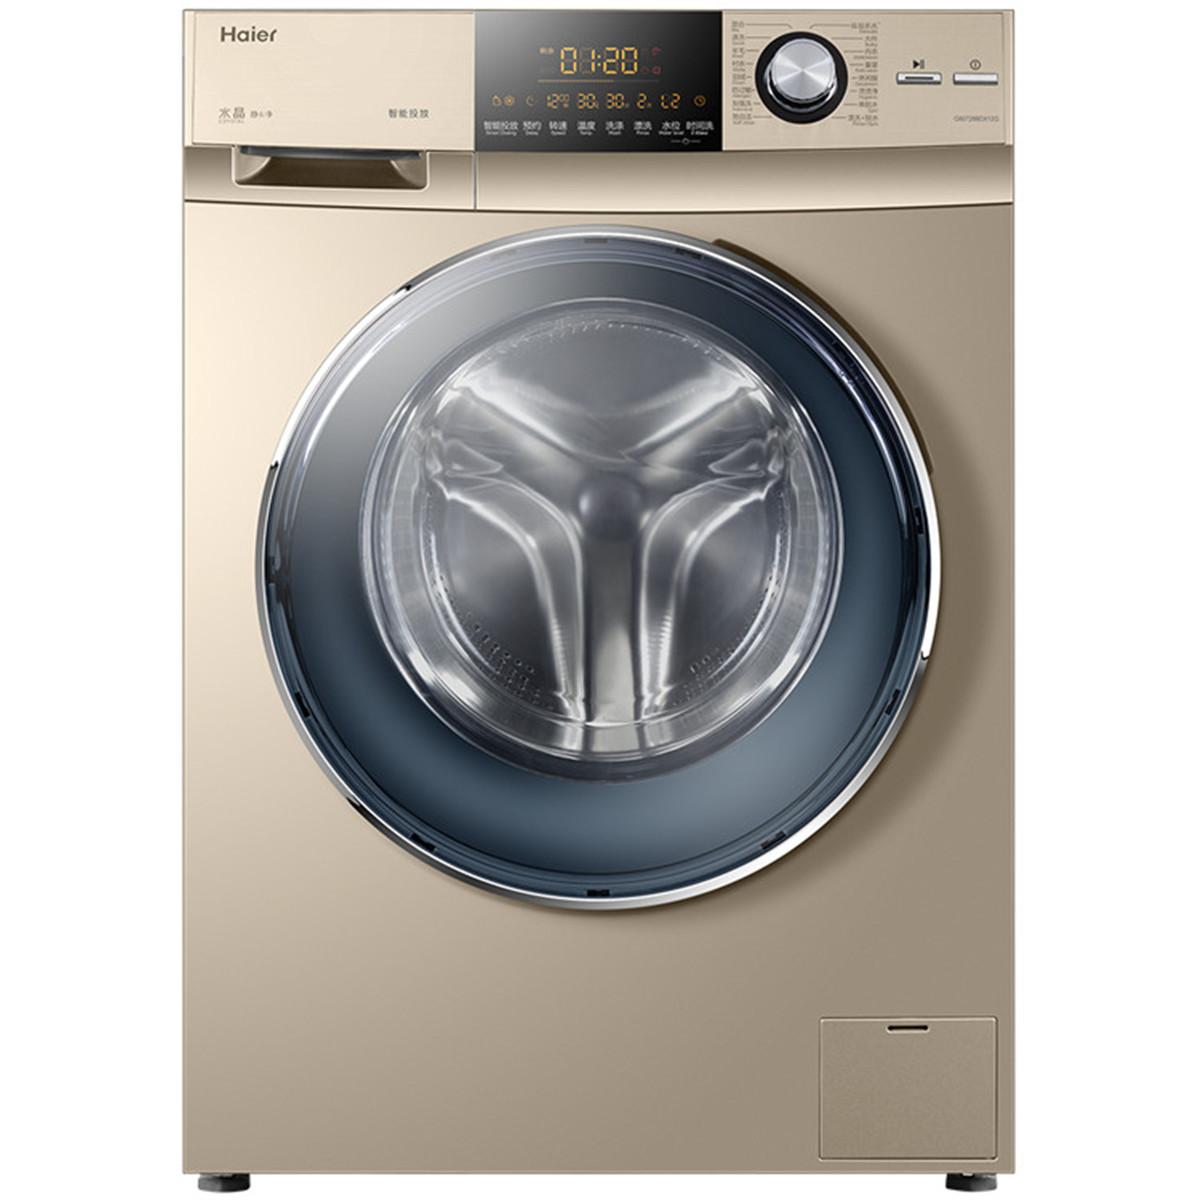 Haier/海尔                         滚筒洗衣机                         G80728BDX12G